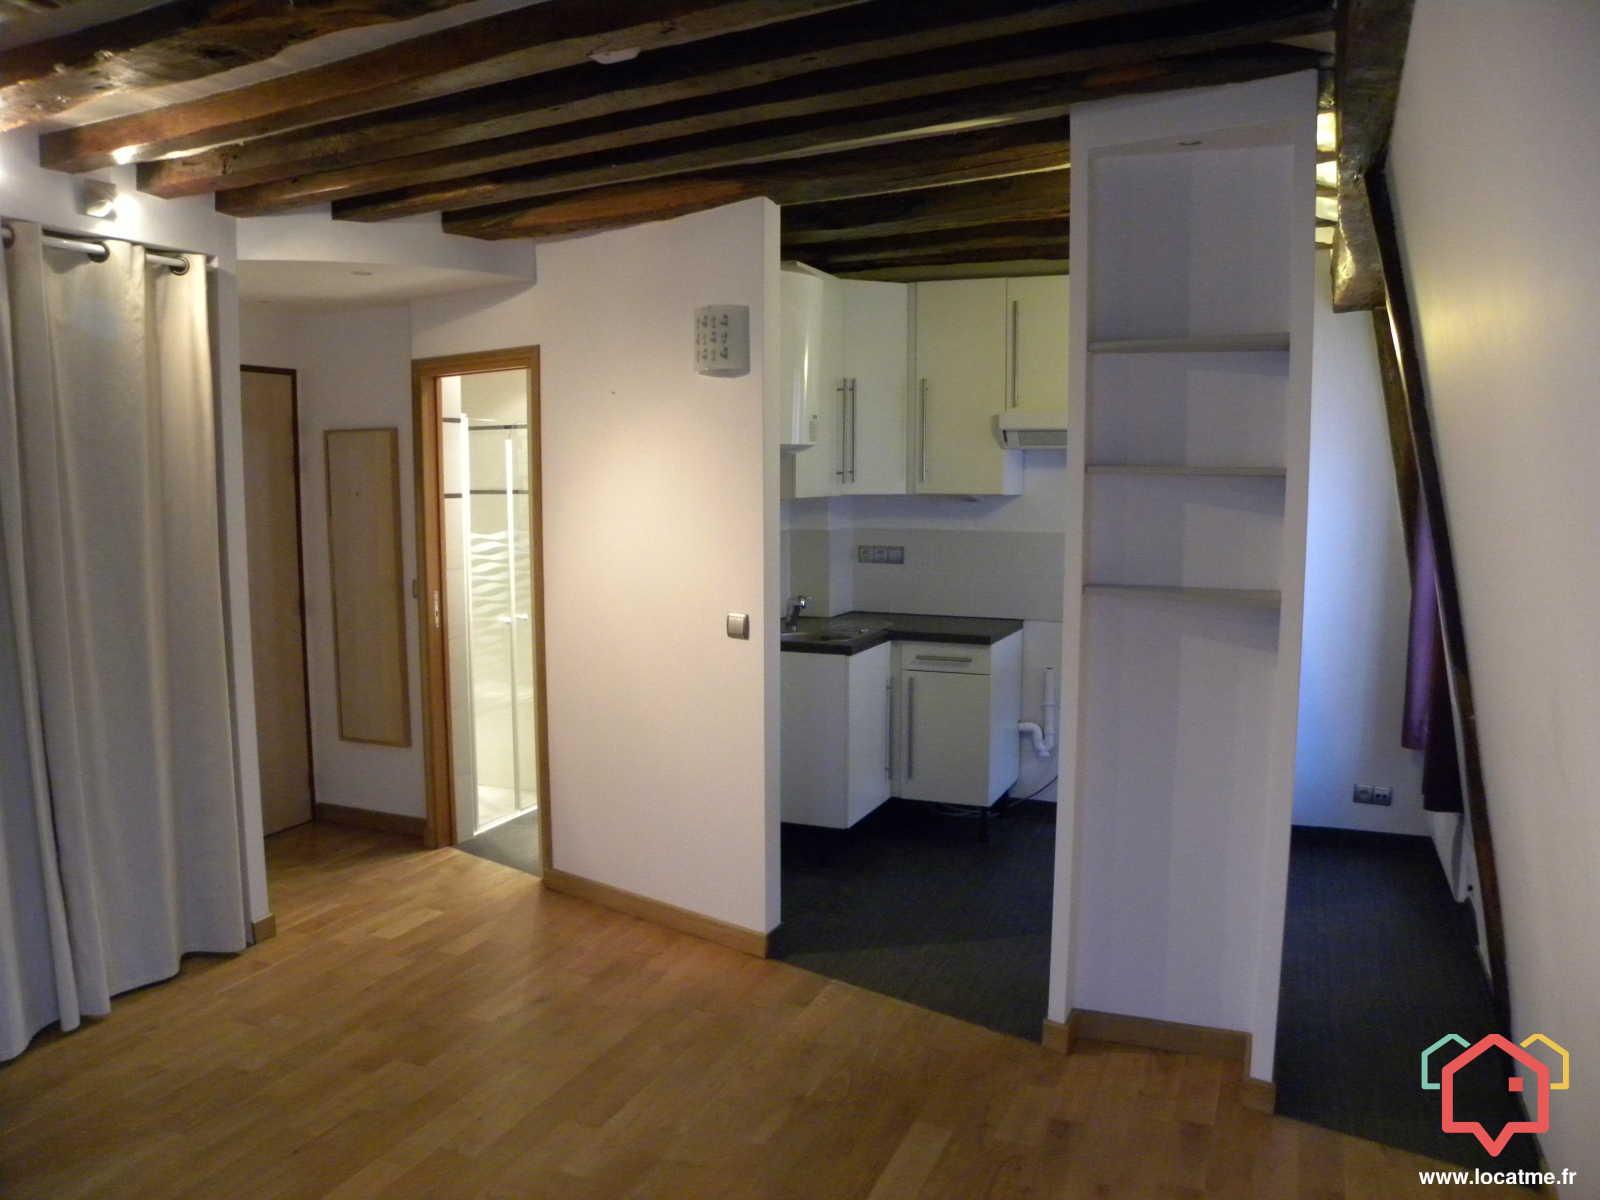 Location De Studios A Versailles 78000 De Particulier A Particulier